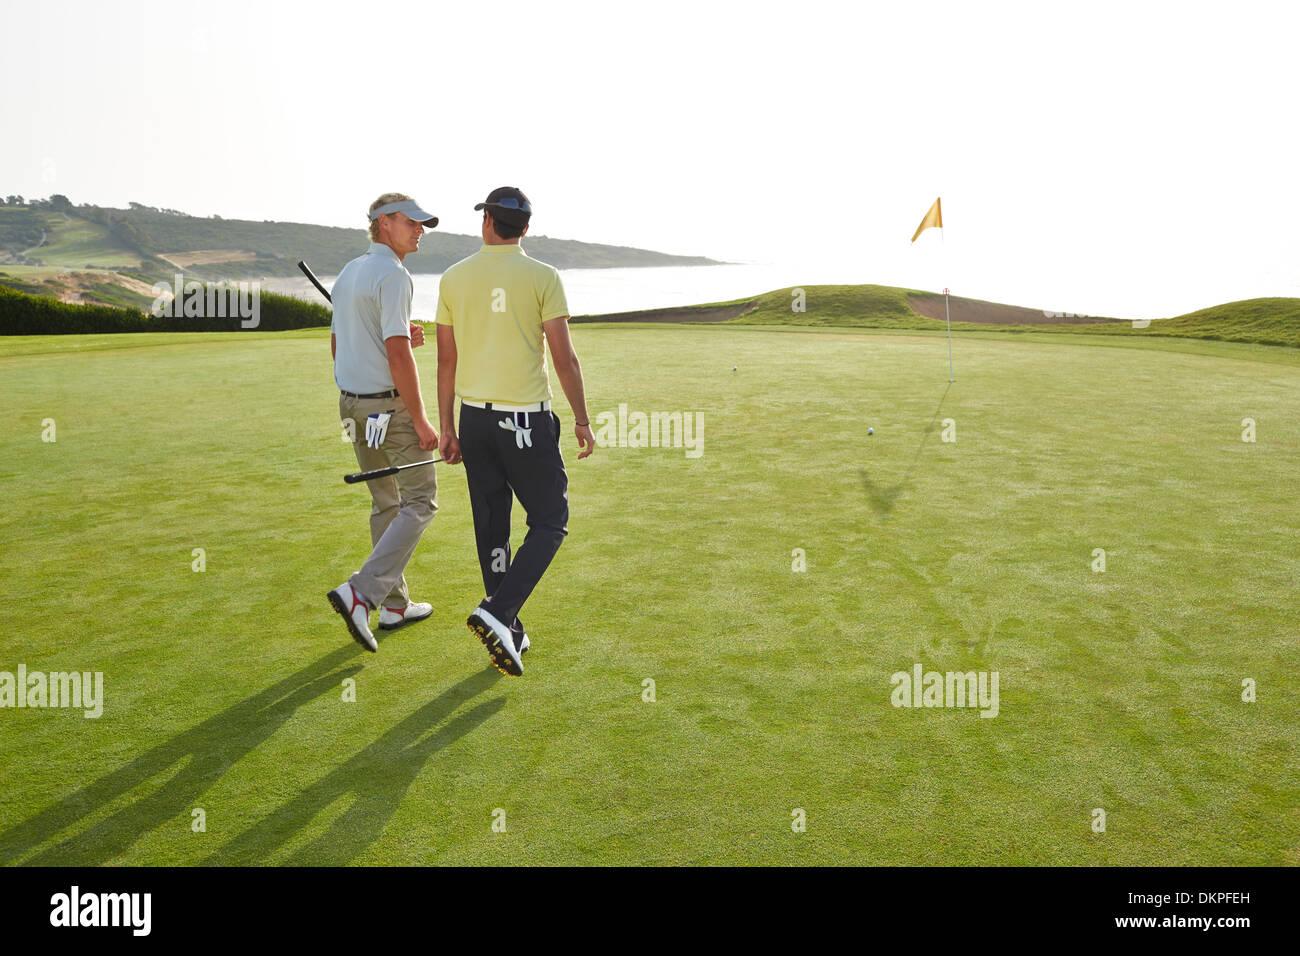 Men walking toward hole on golf course overlooking ocean Stock Photo